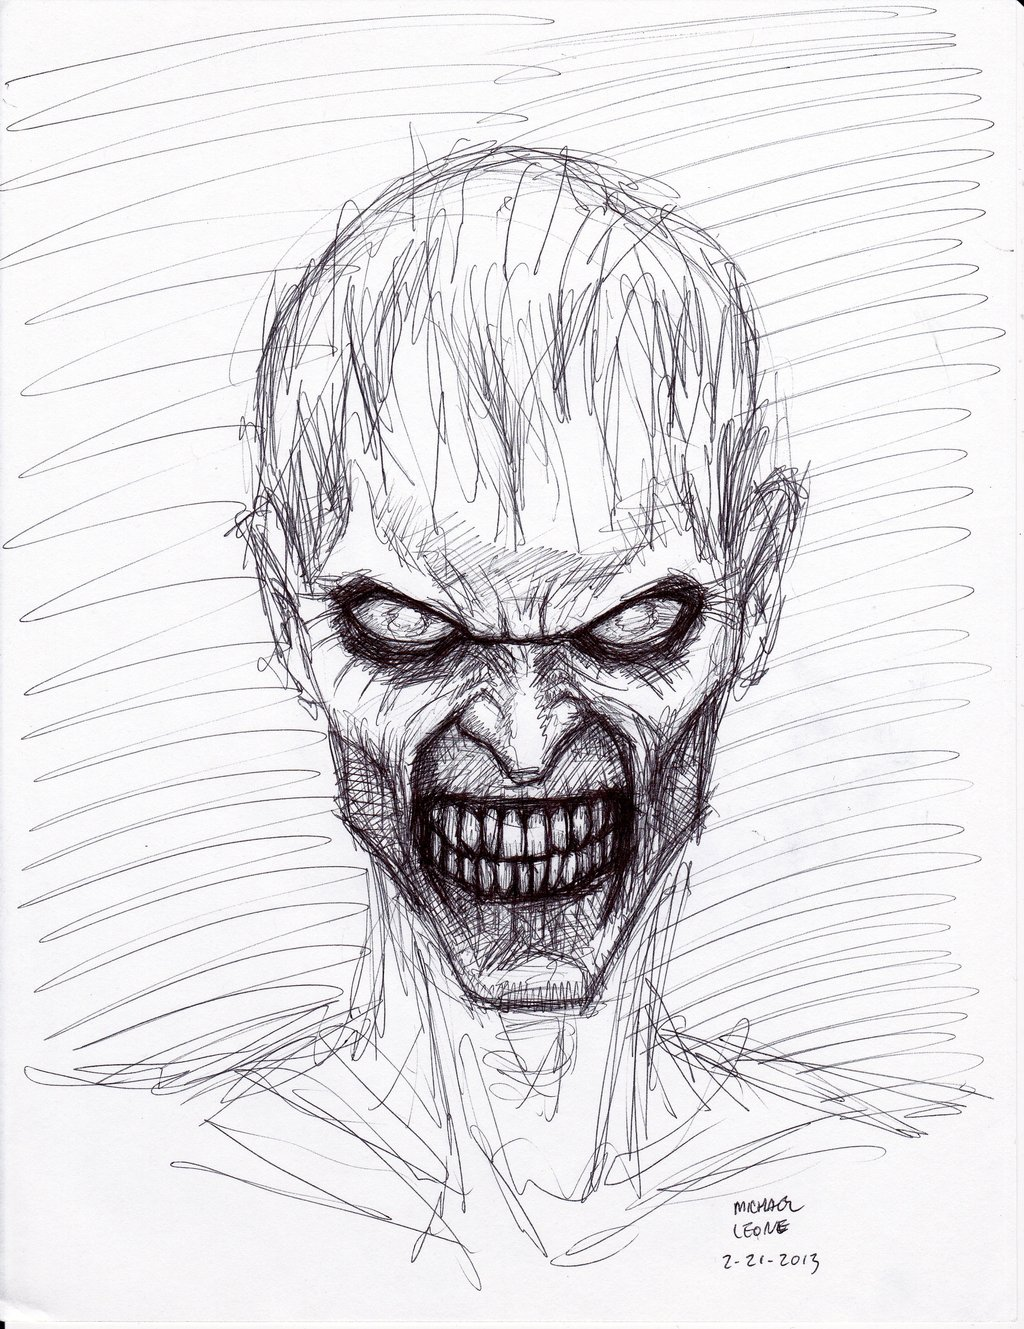 1024x1329 Zombie drawings in pencil Zombie Pen Sketch 2 21 2013 By